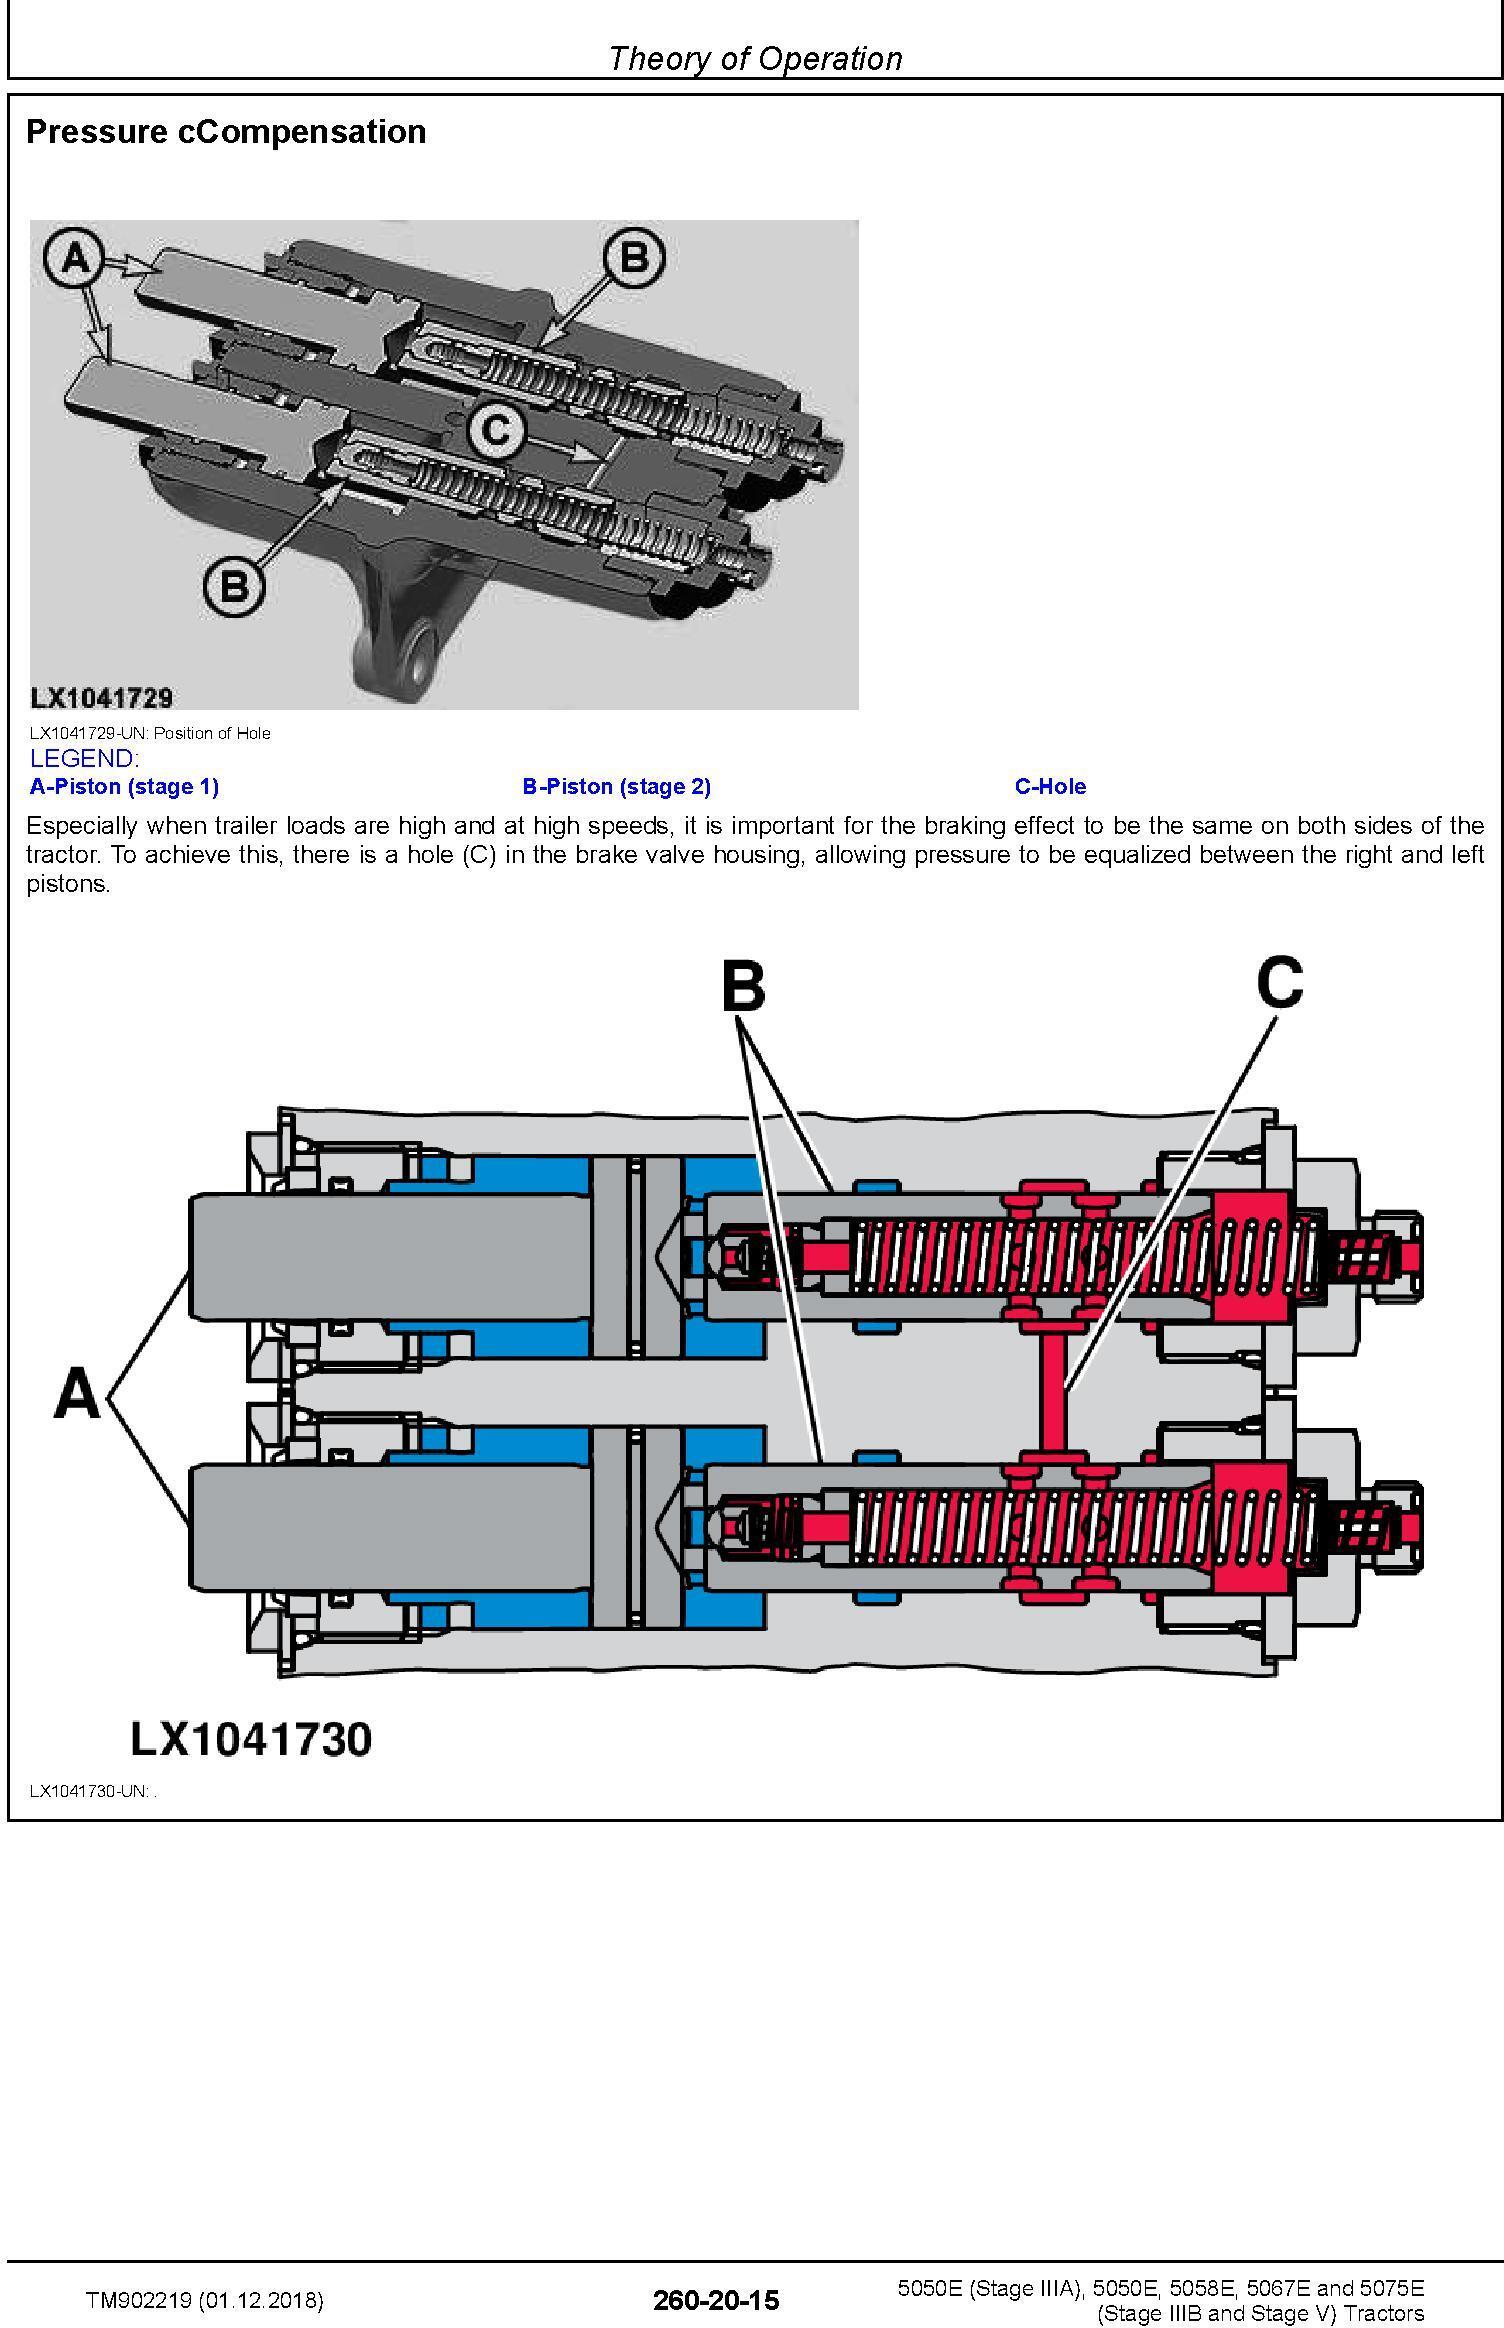 John Deere 5050E, 5050E, 5058E, 5067E, 5075E Tractors Diagnostic Technical Service Manual (TM902219) - 1